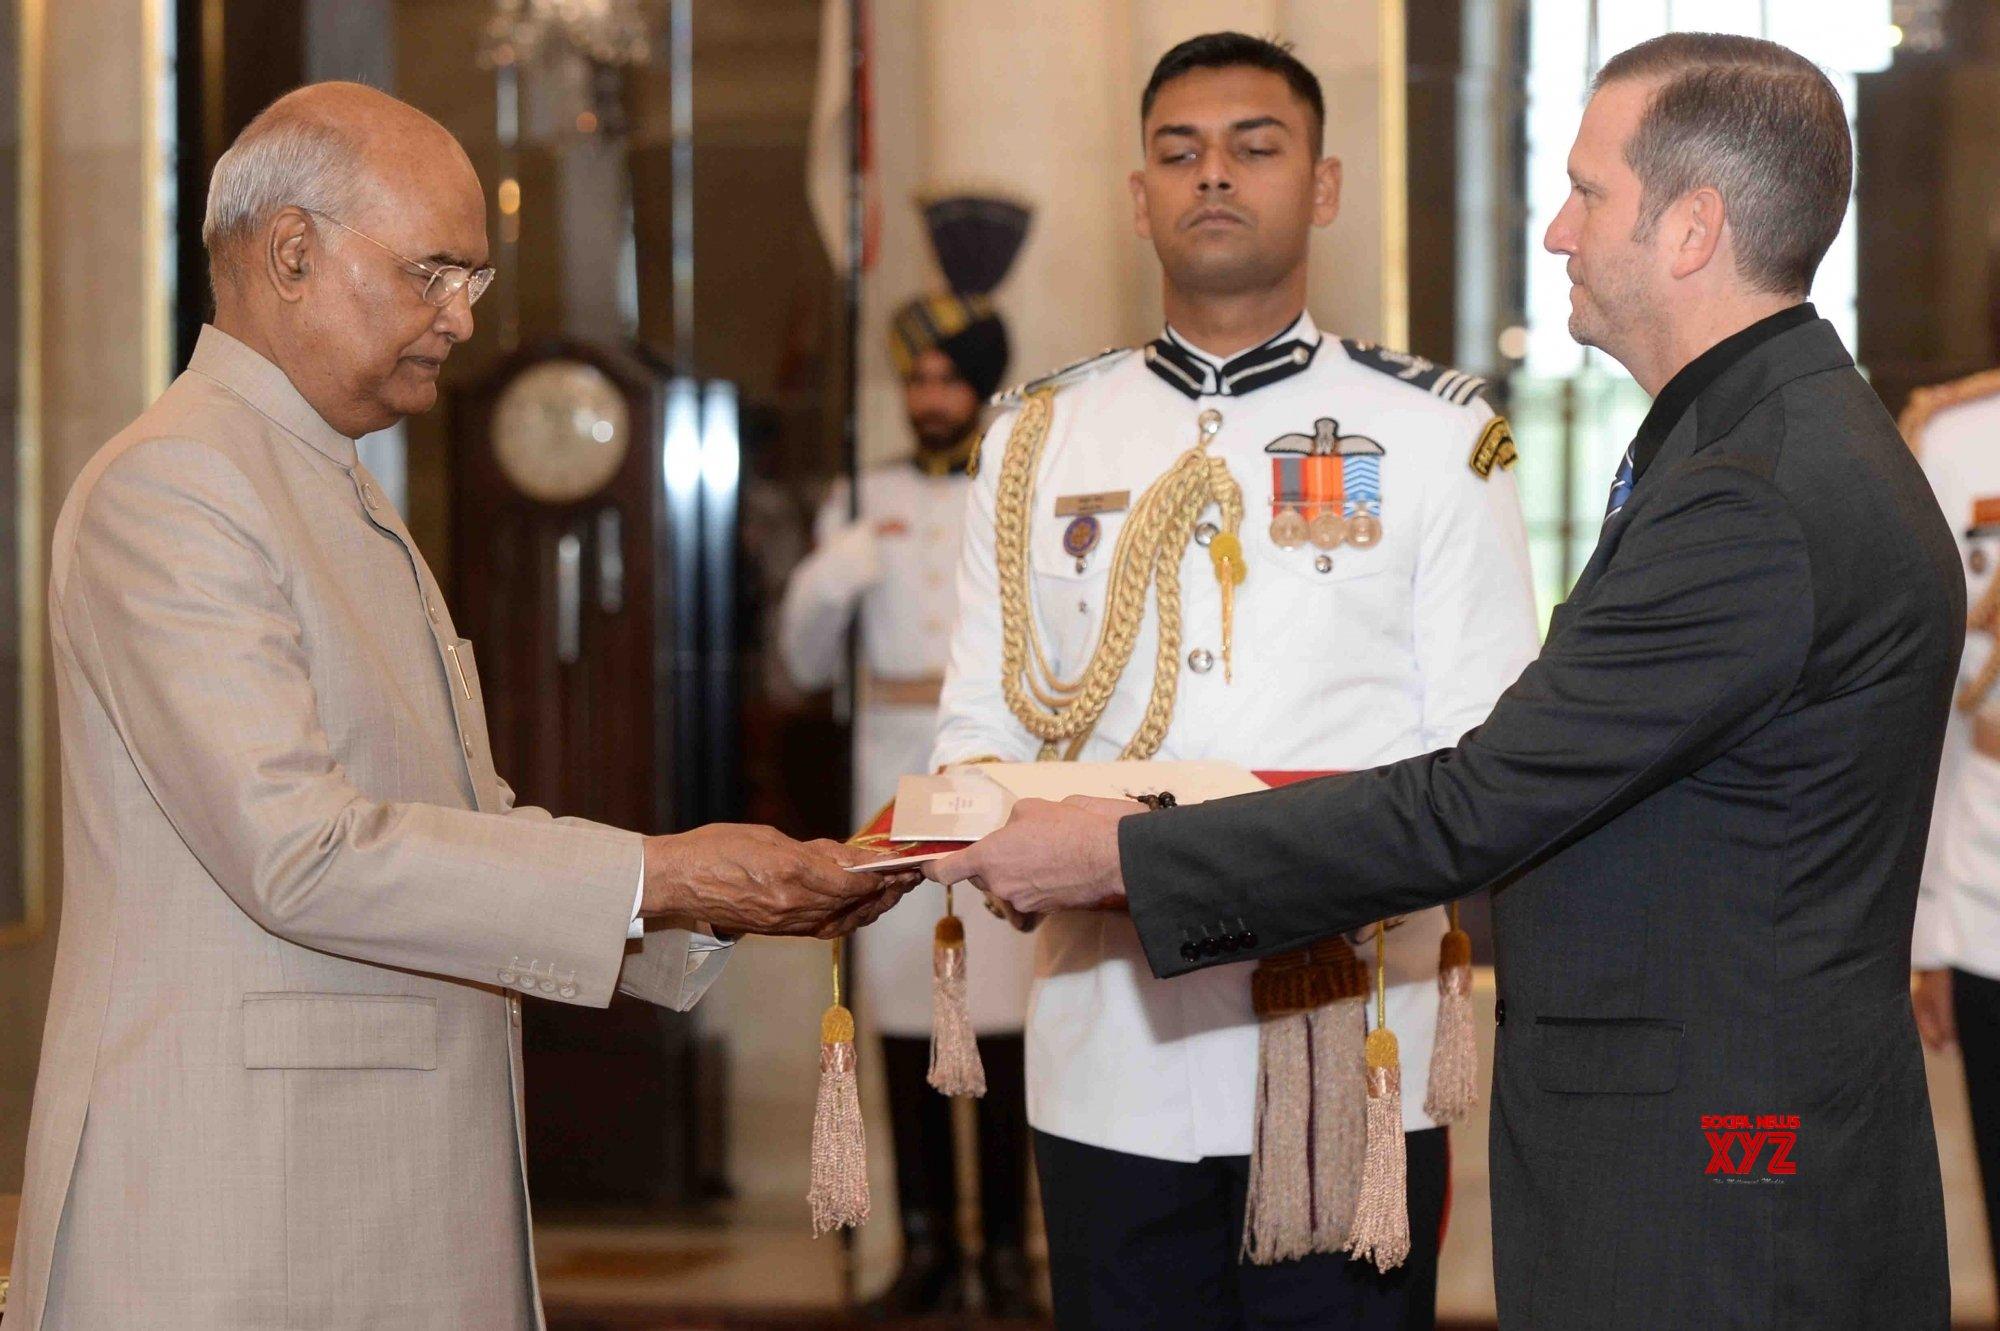 New Delhi: Nicaragua Ambassador - designate presents credentials to President Kovind #Gallery